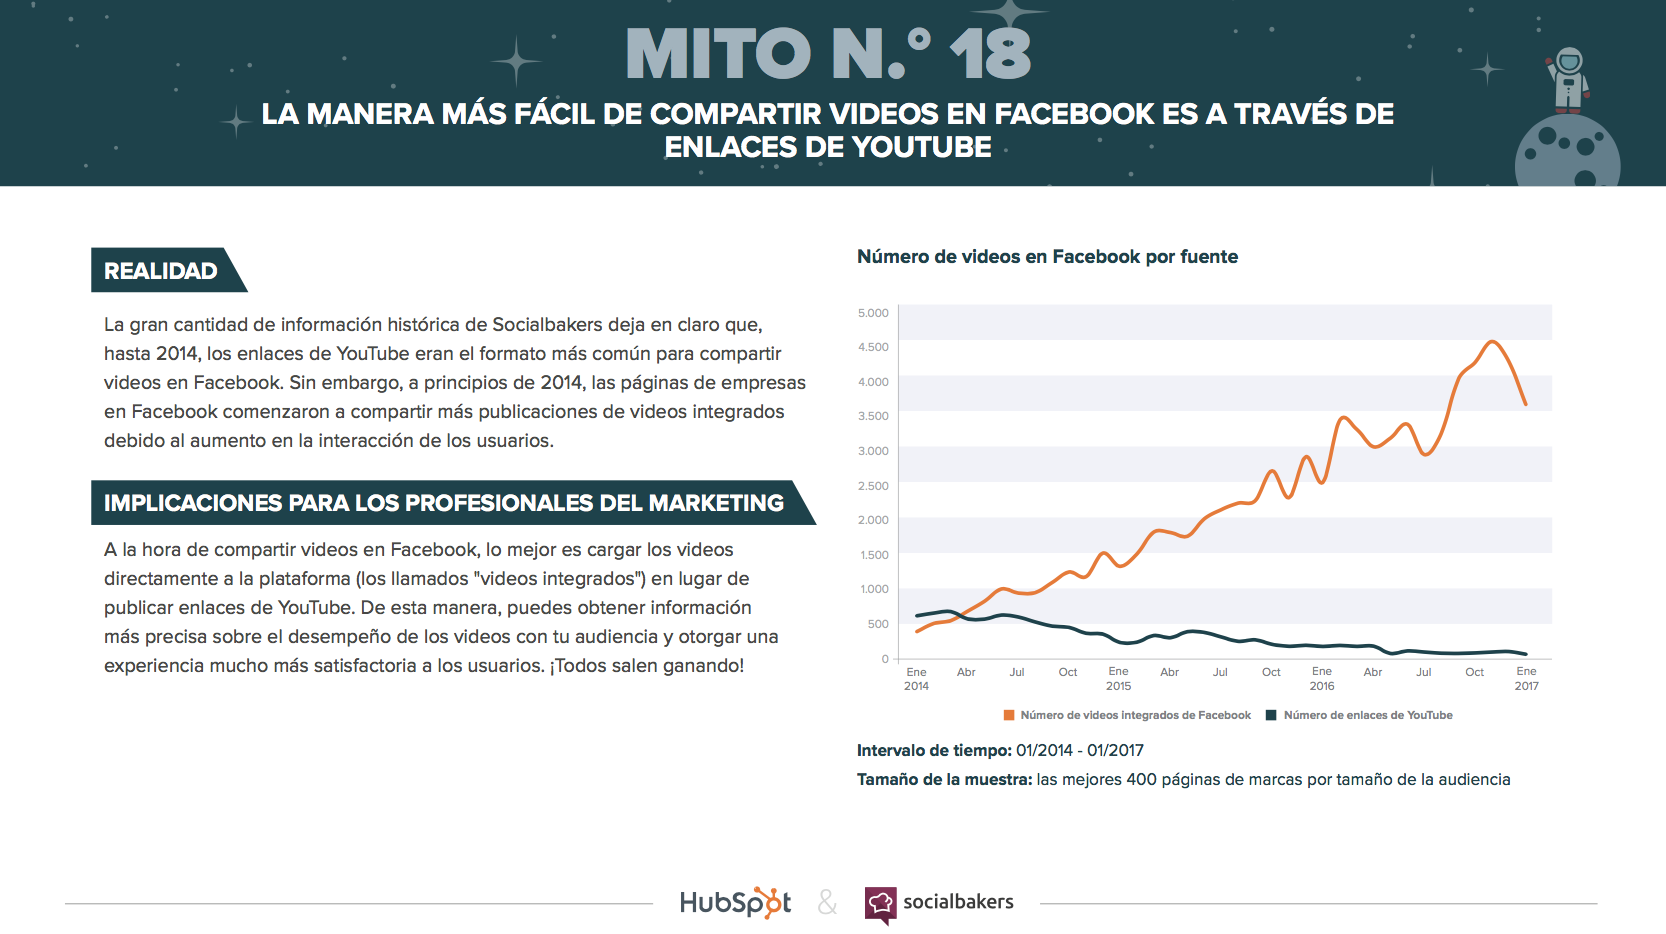 Mitos_marketing_Facebook_3.png